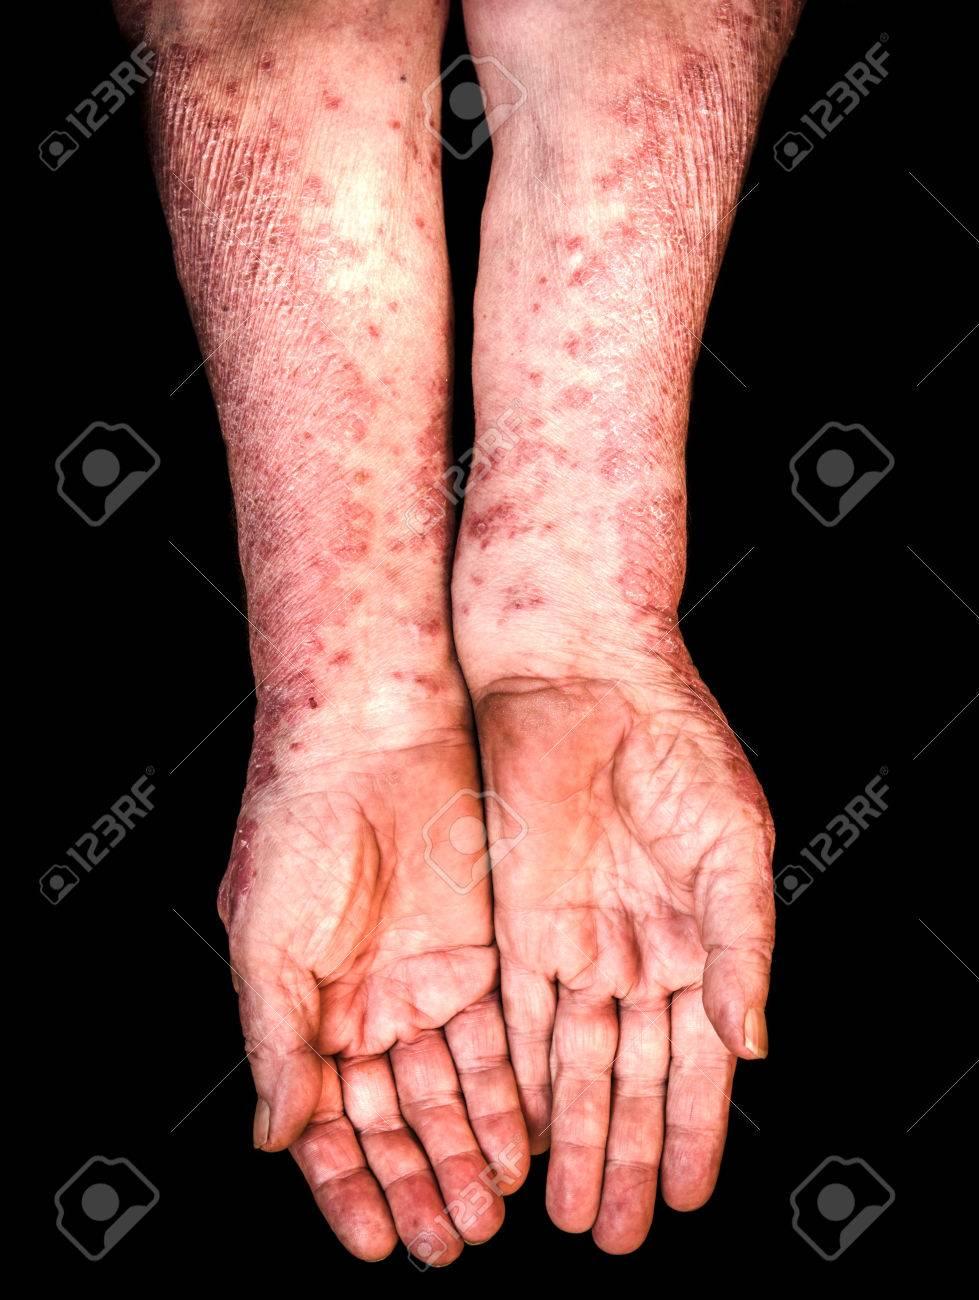 http://n3.datasn.io/data/api/v1/n3zm/image_of_skin_disease_5/main/skin_disease_image_download//9a/ac/95/b4/9aac95b464df82b64678e2504782292995e9b7fb.jpg